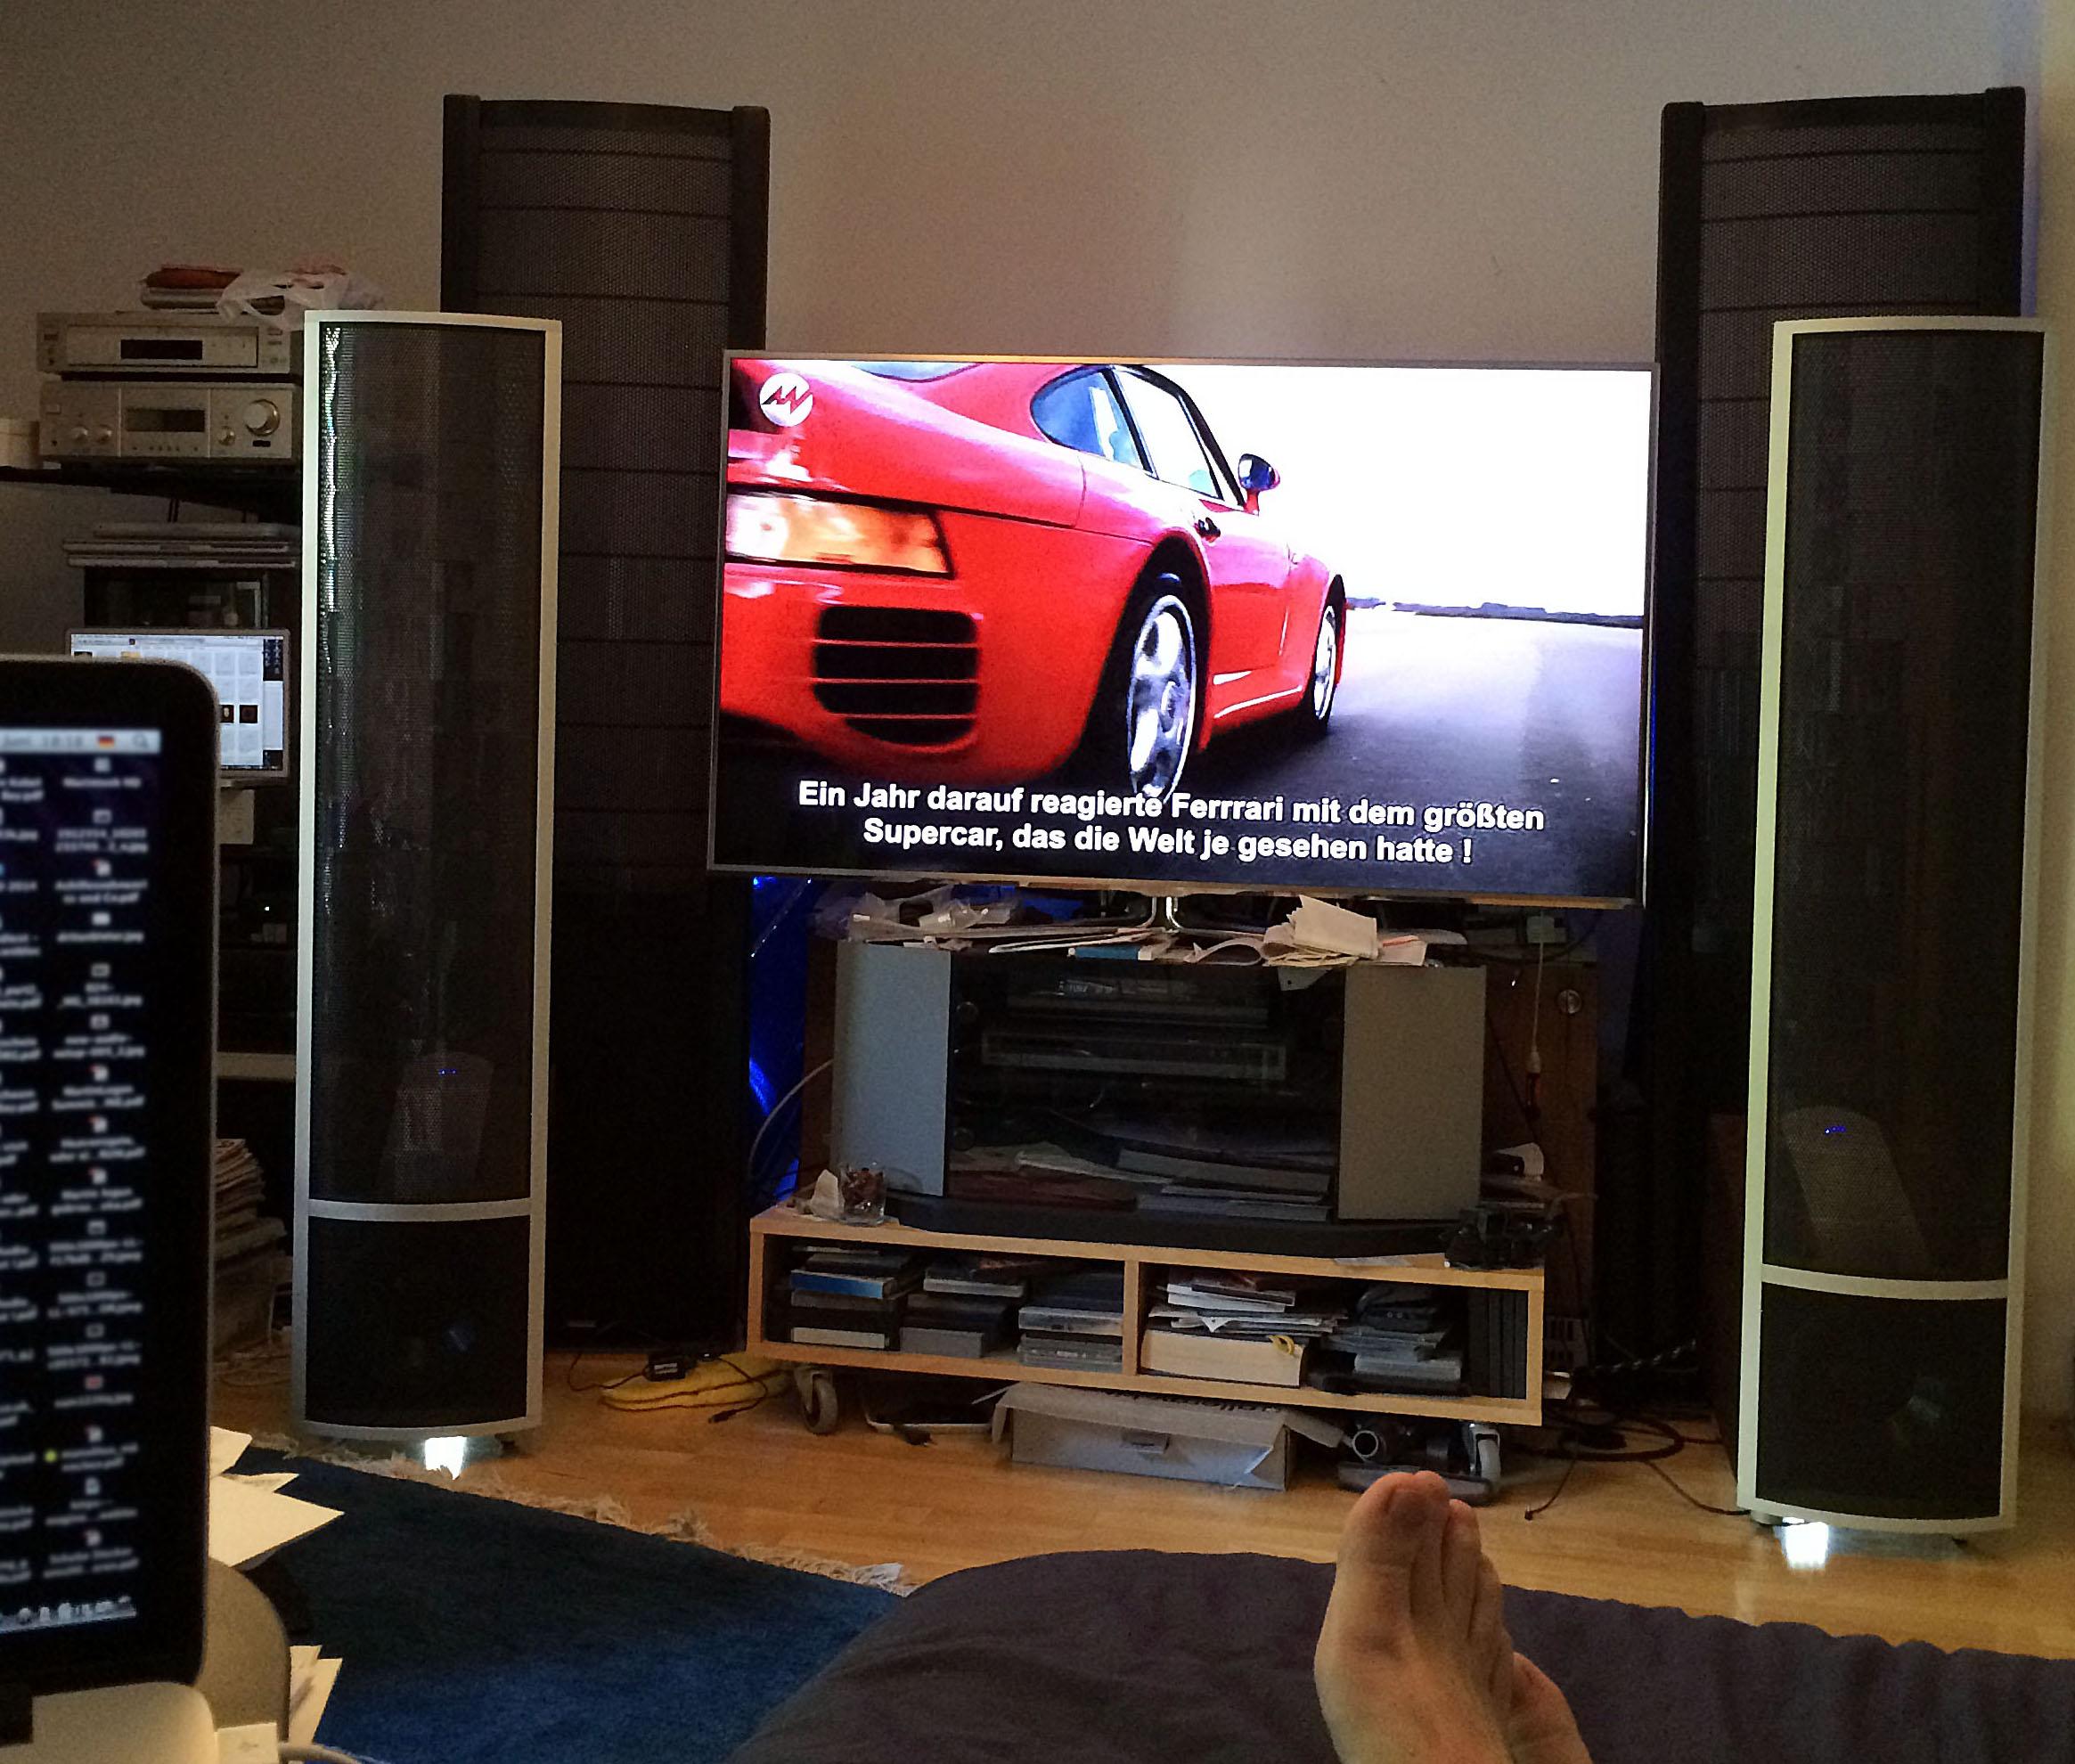 martinlogan martin gloss logan speaker high motion bookshelf hgb pair product black speakers